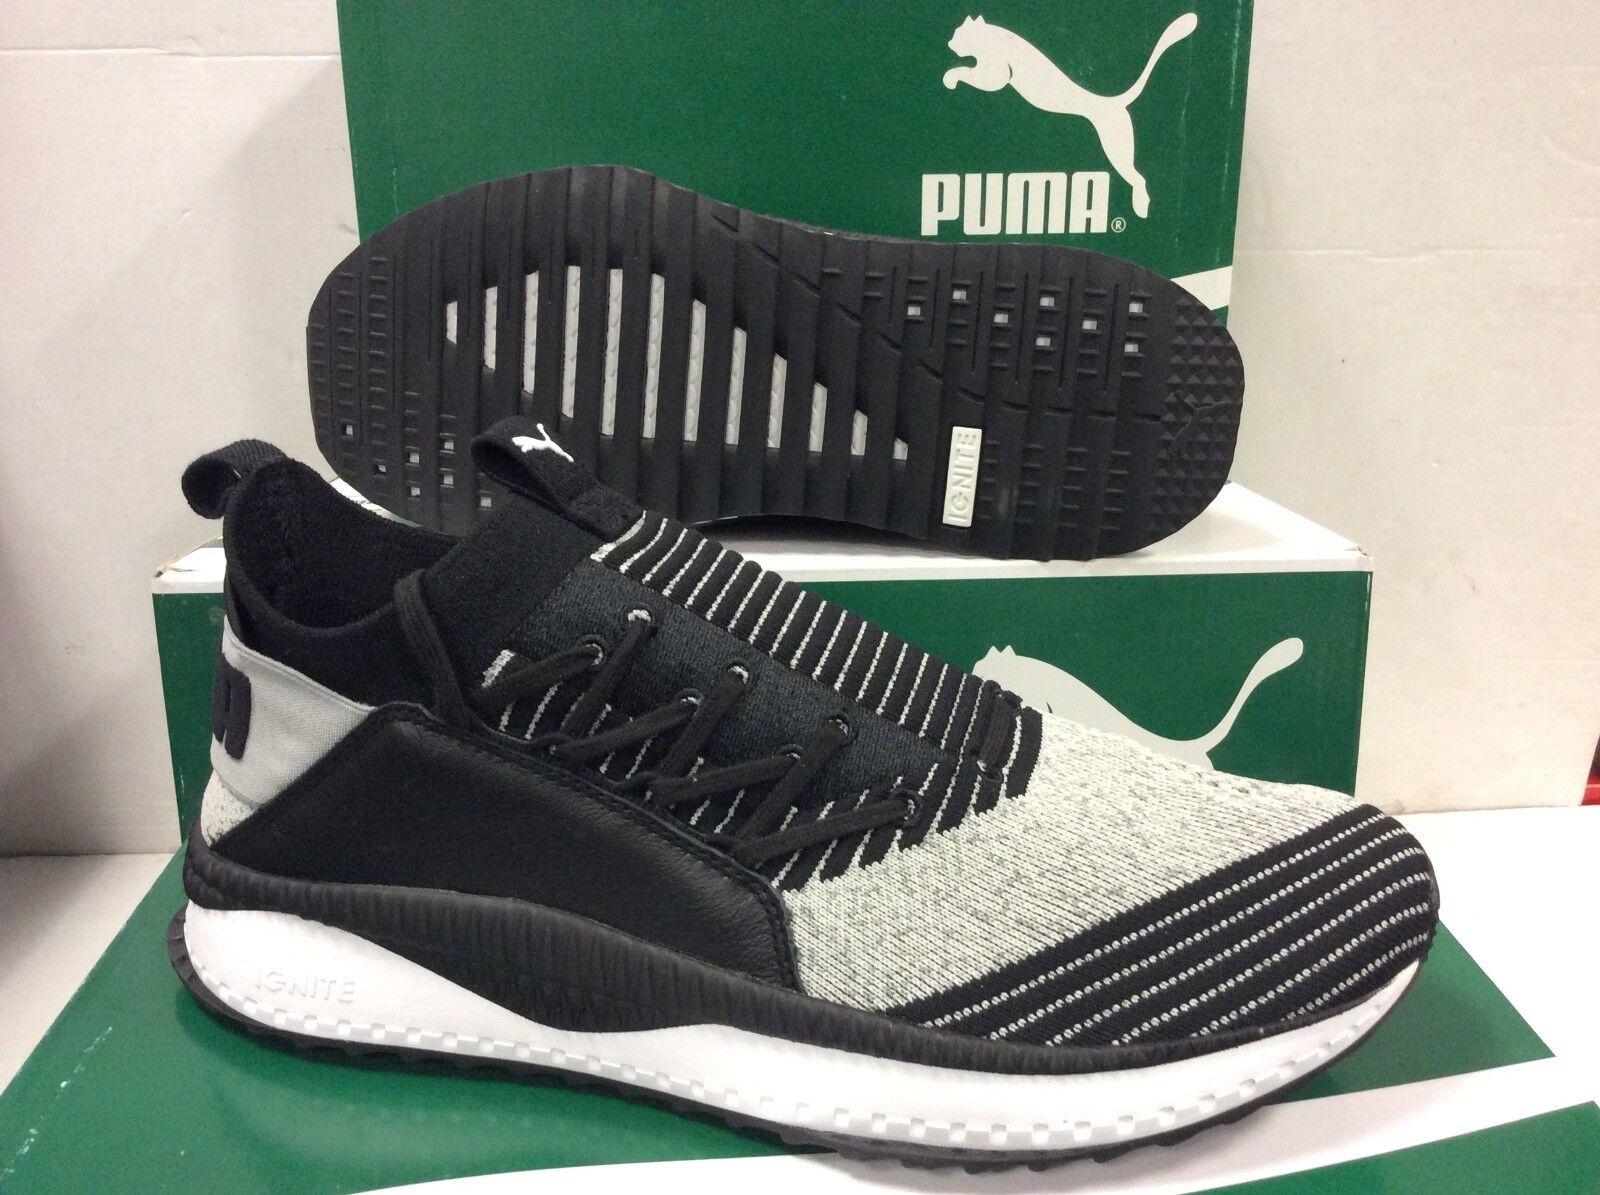 Puma Tsugi Jun Ignite evoknit Para hombre Zapatillas, Talla UK 9 43 euros USA 10